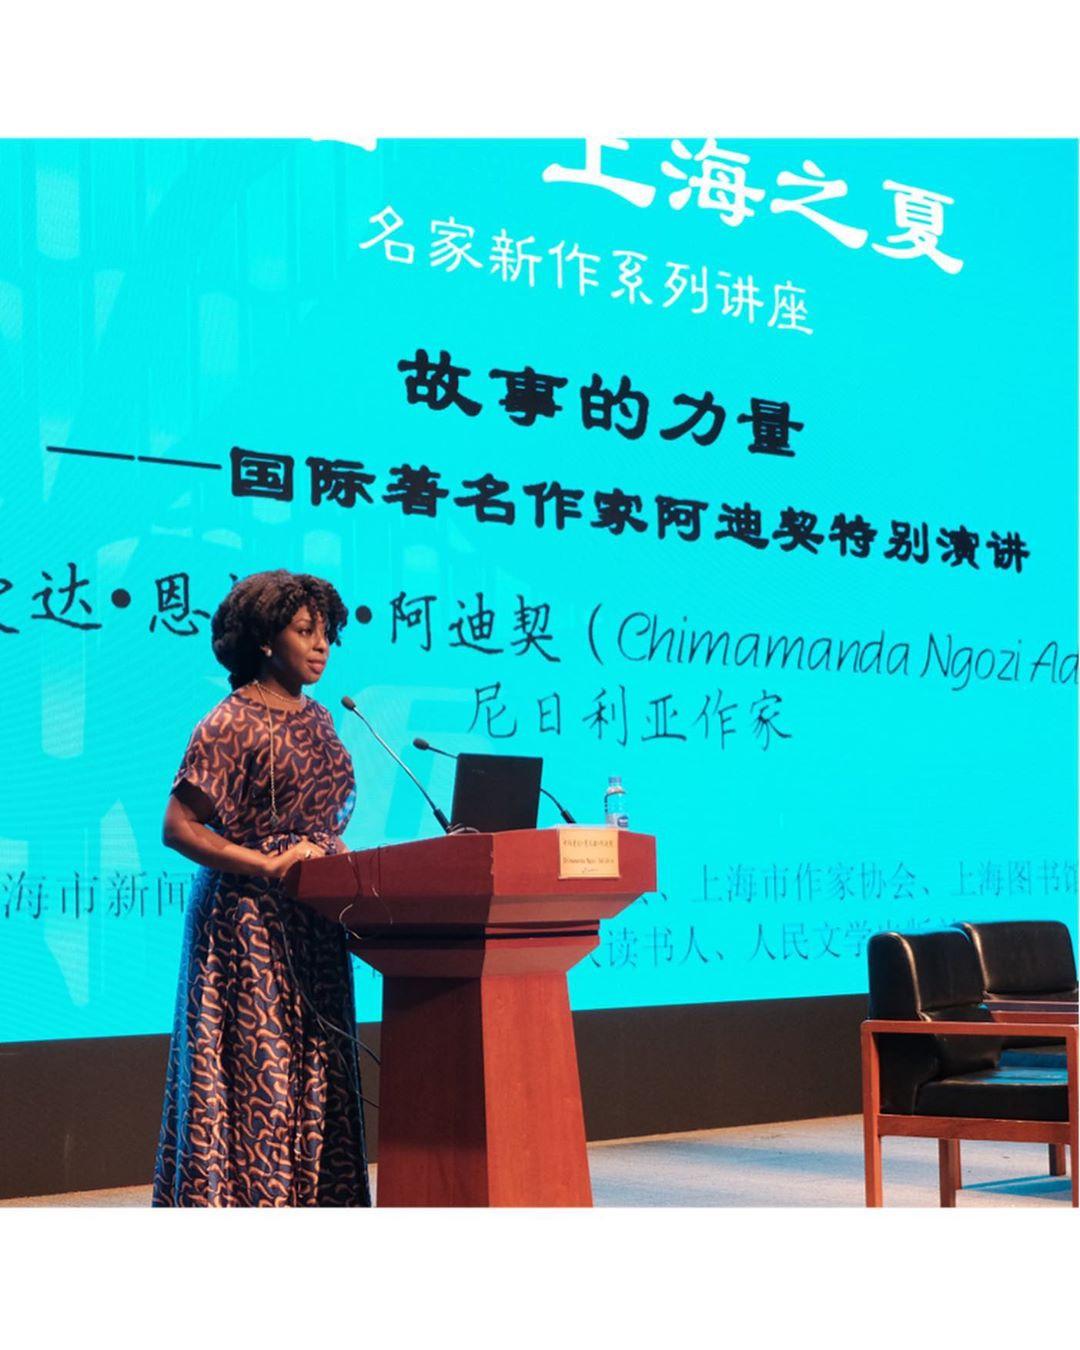 Chimamanda Ngozi Adichie attends Shanghai Book Fair, Gives Public Lecture